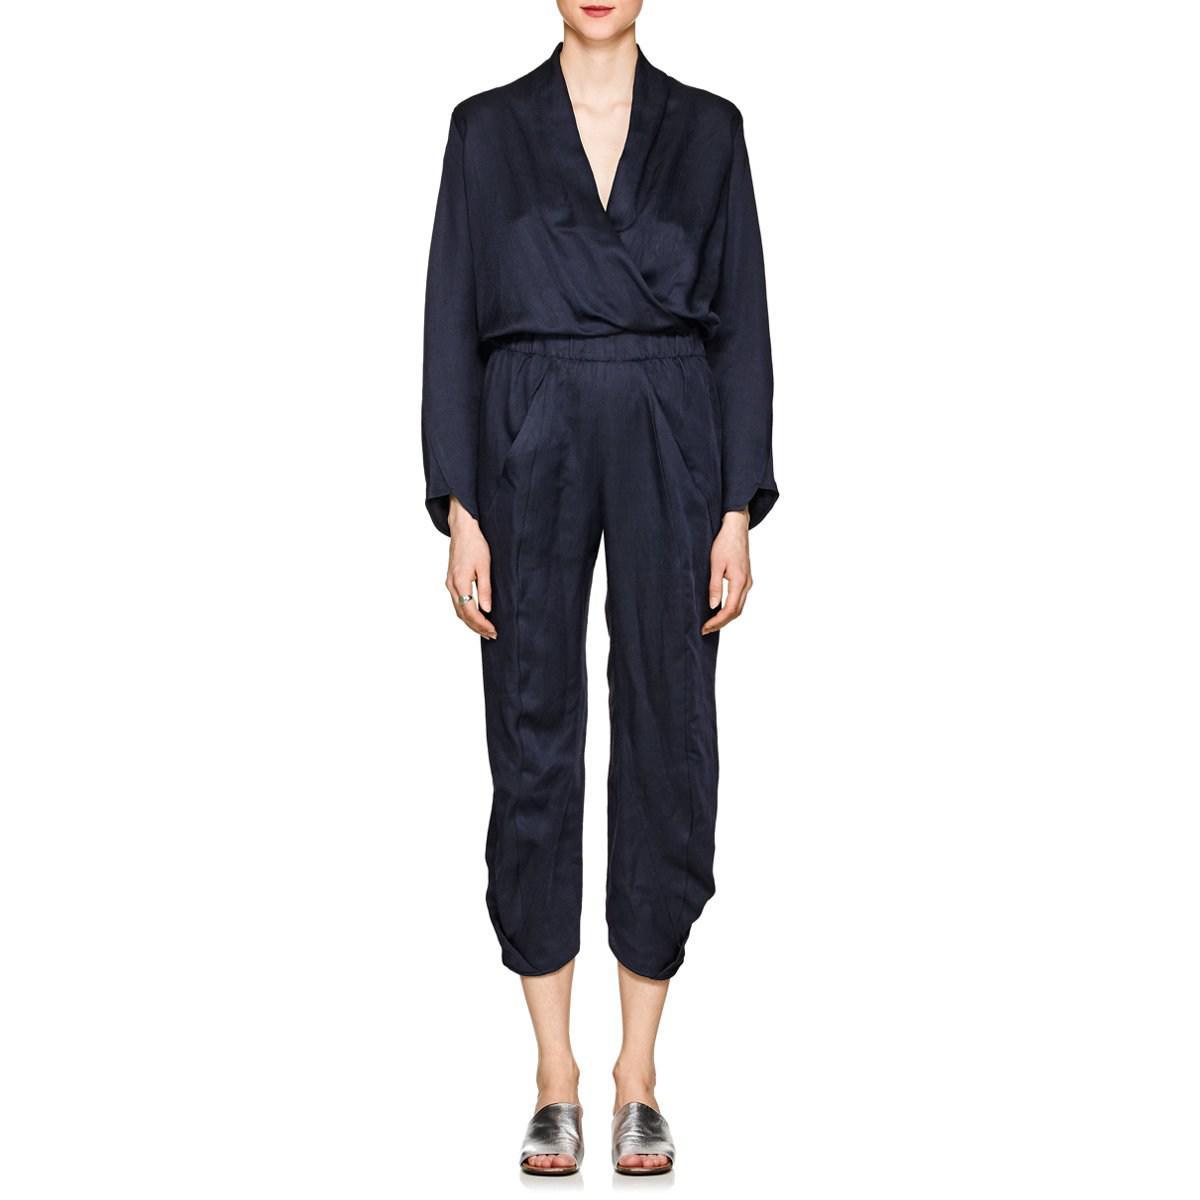 Womens Takeo Twill V-Neck Jumpsuit Zero + Maria Cornejo Buy Cheap Wide Range Of Marketable For Sale Latest Collections  Cheap Free Shipping Footlocker Finishline Cheap Online MegjizNN